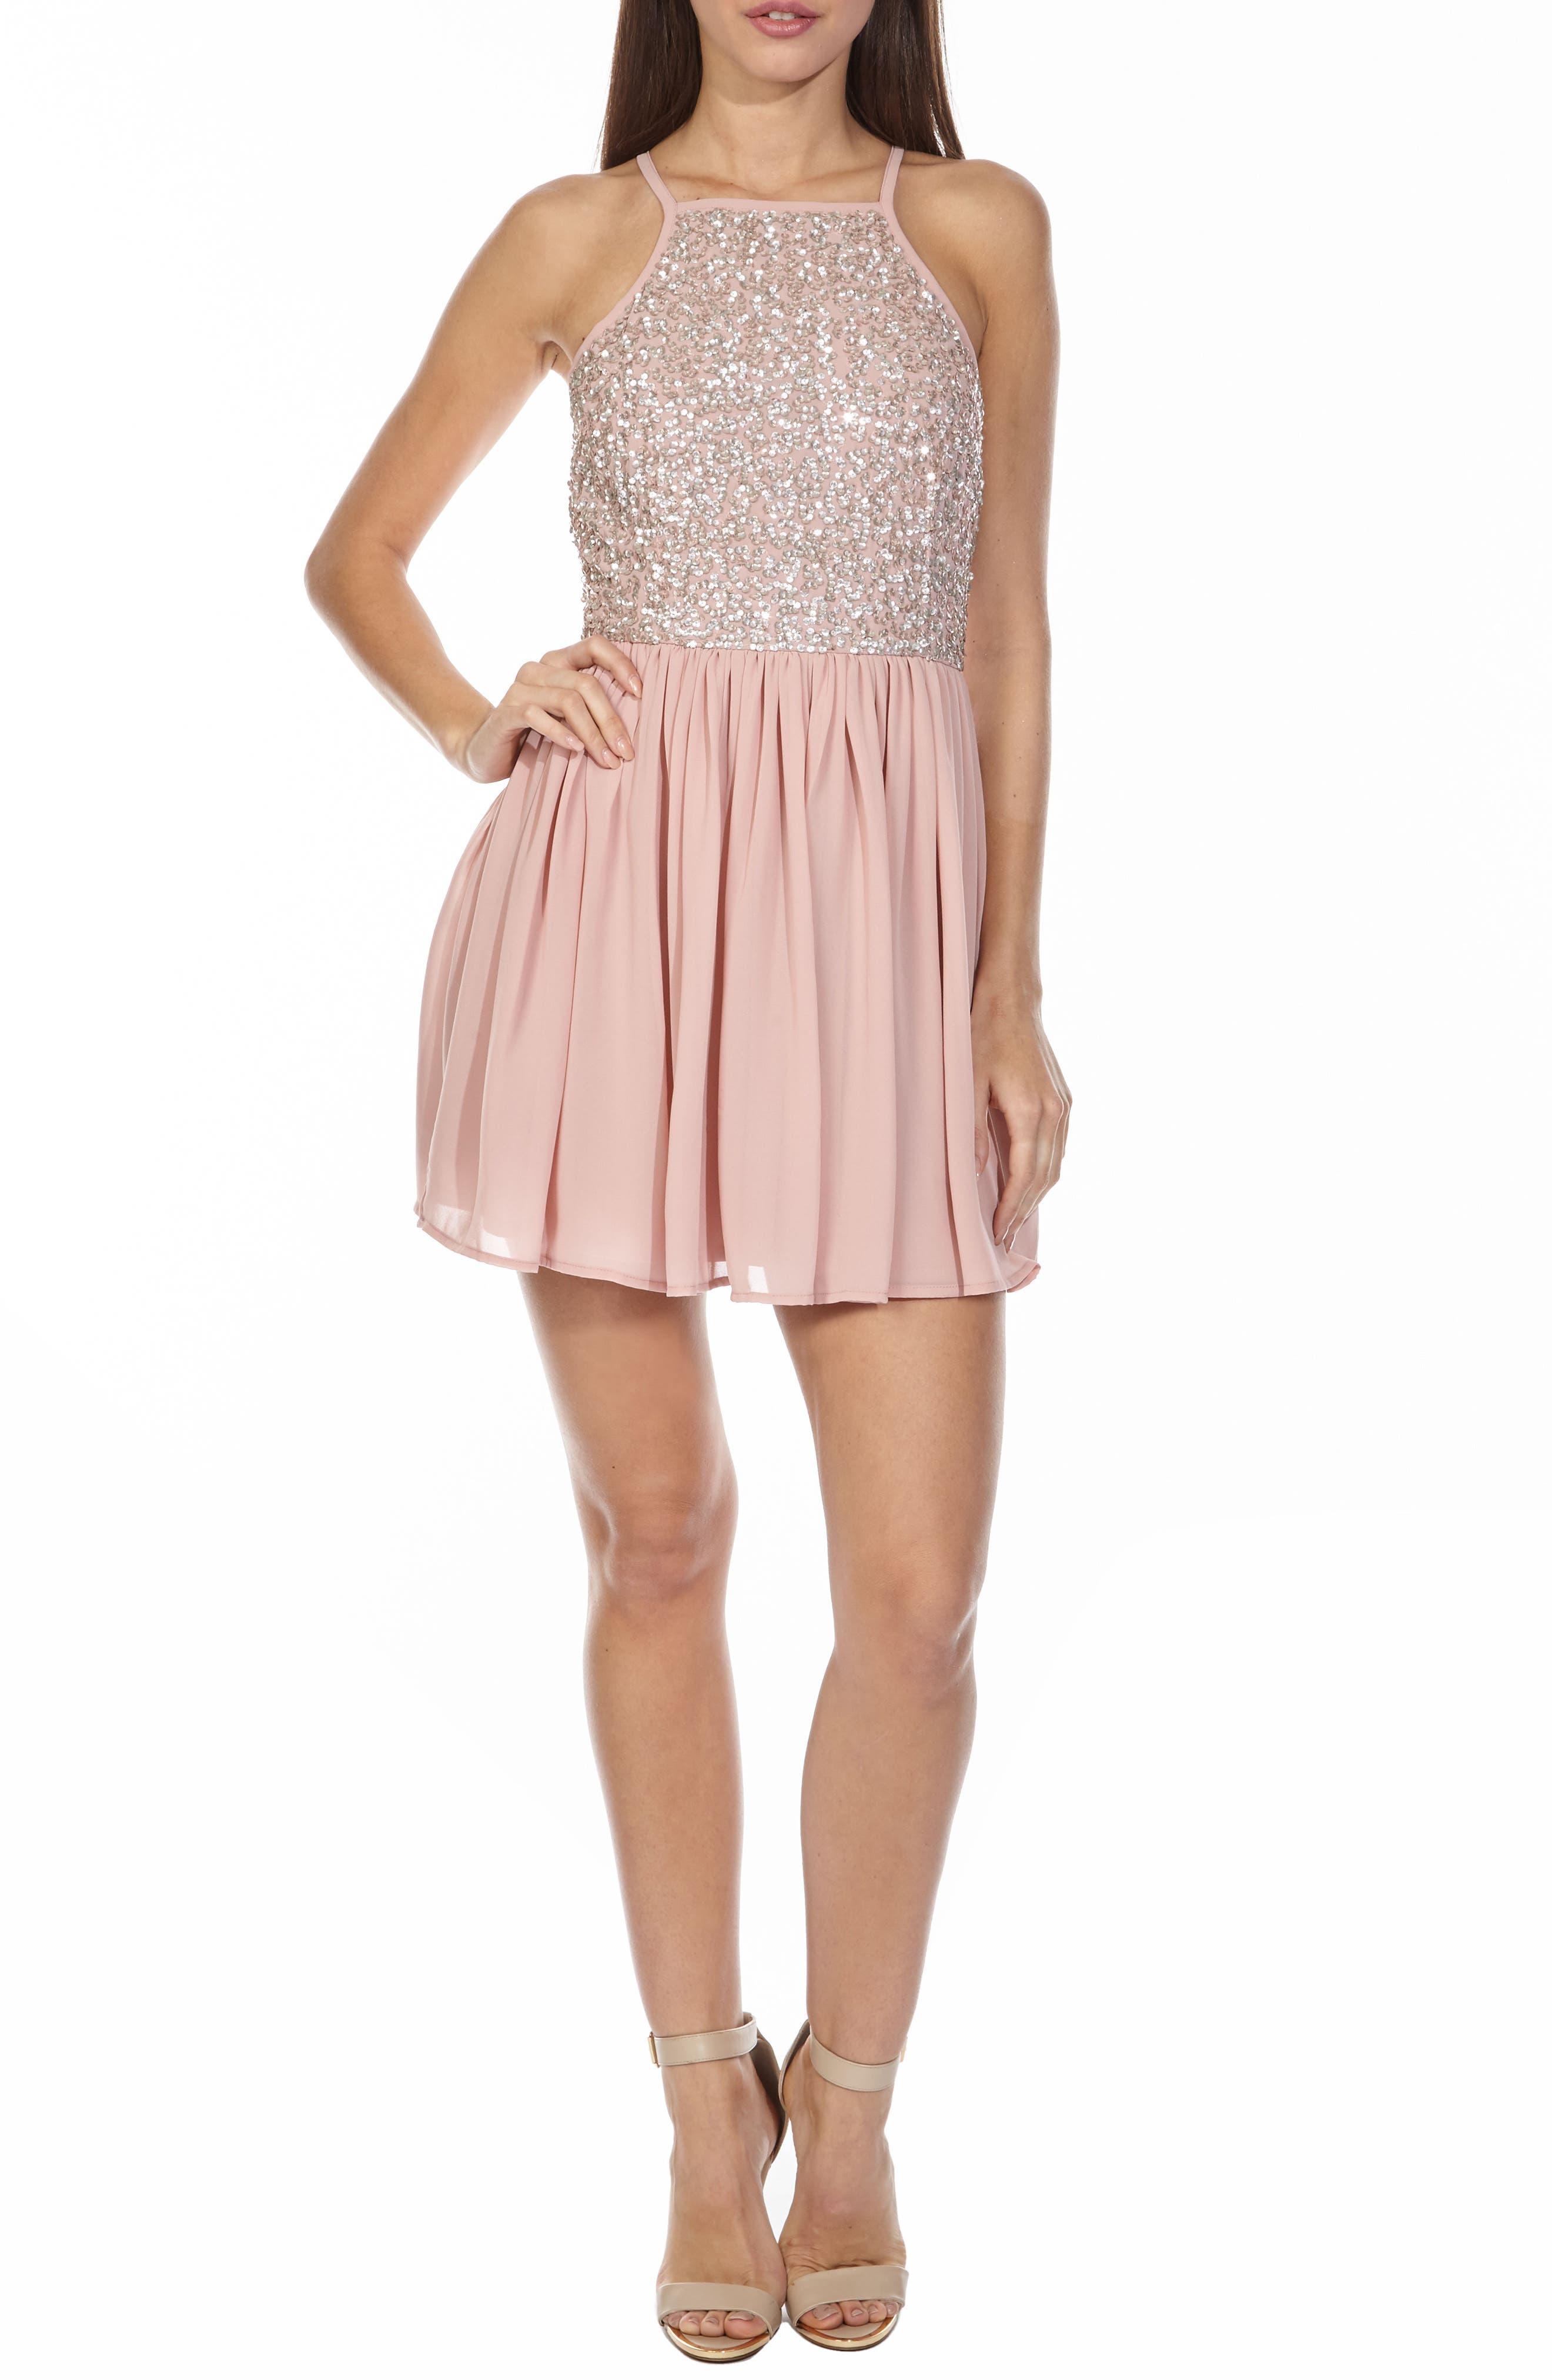 Lace & Beads Sprinkle Sequin Skater Dress